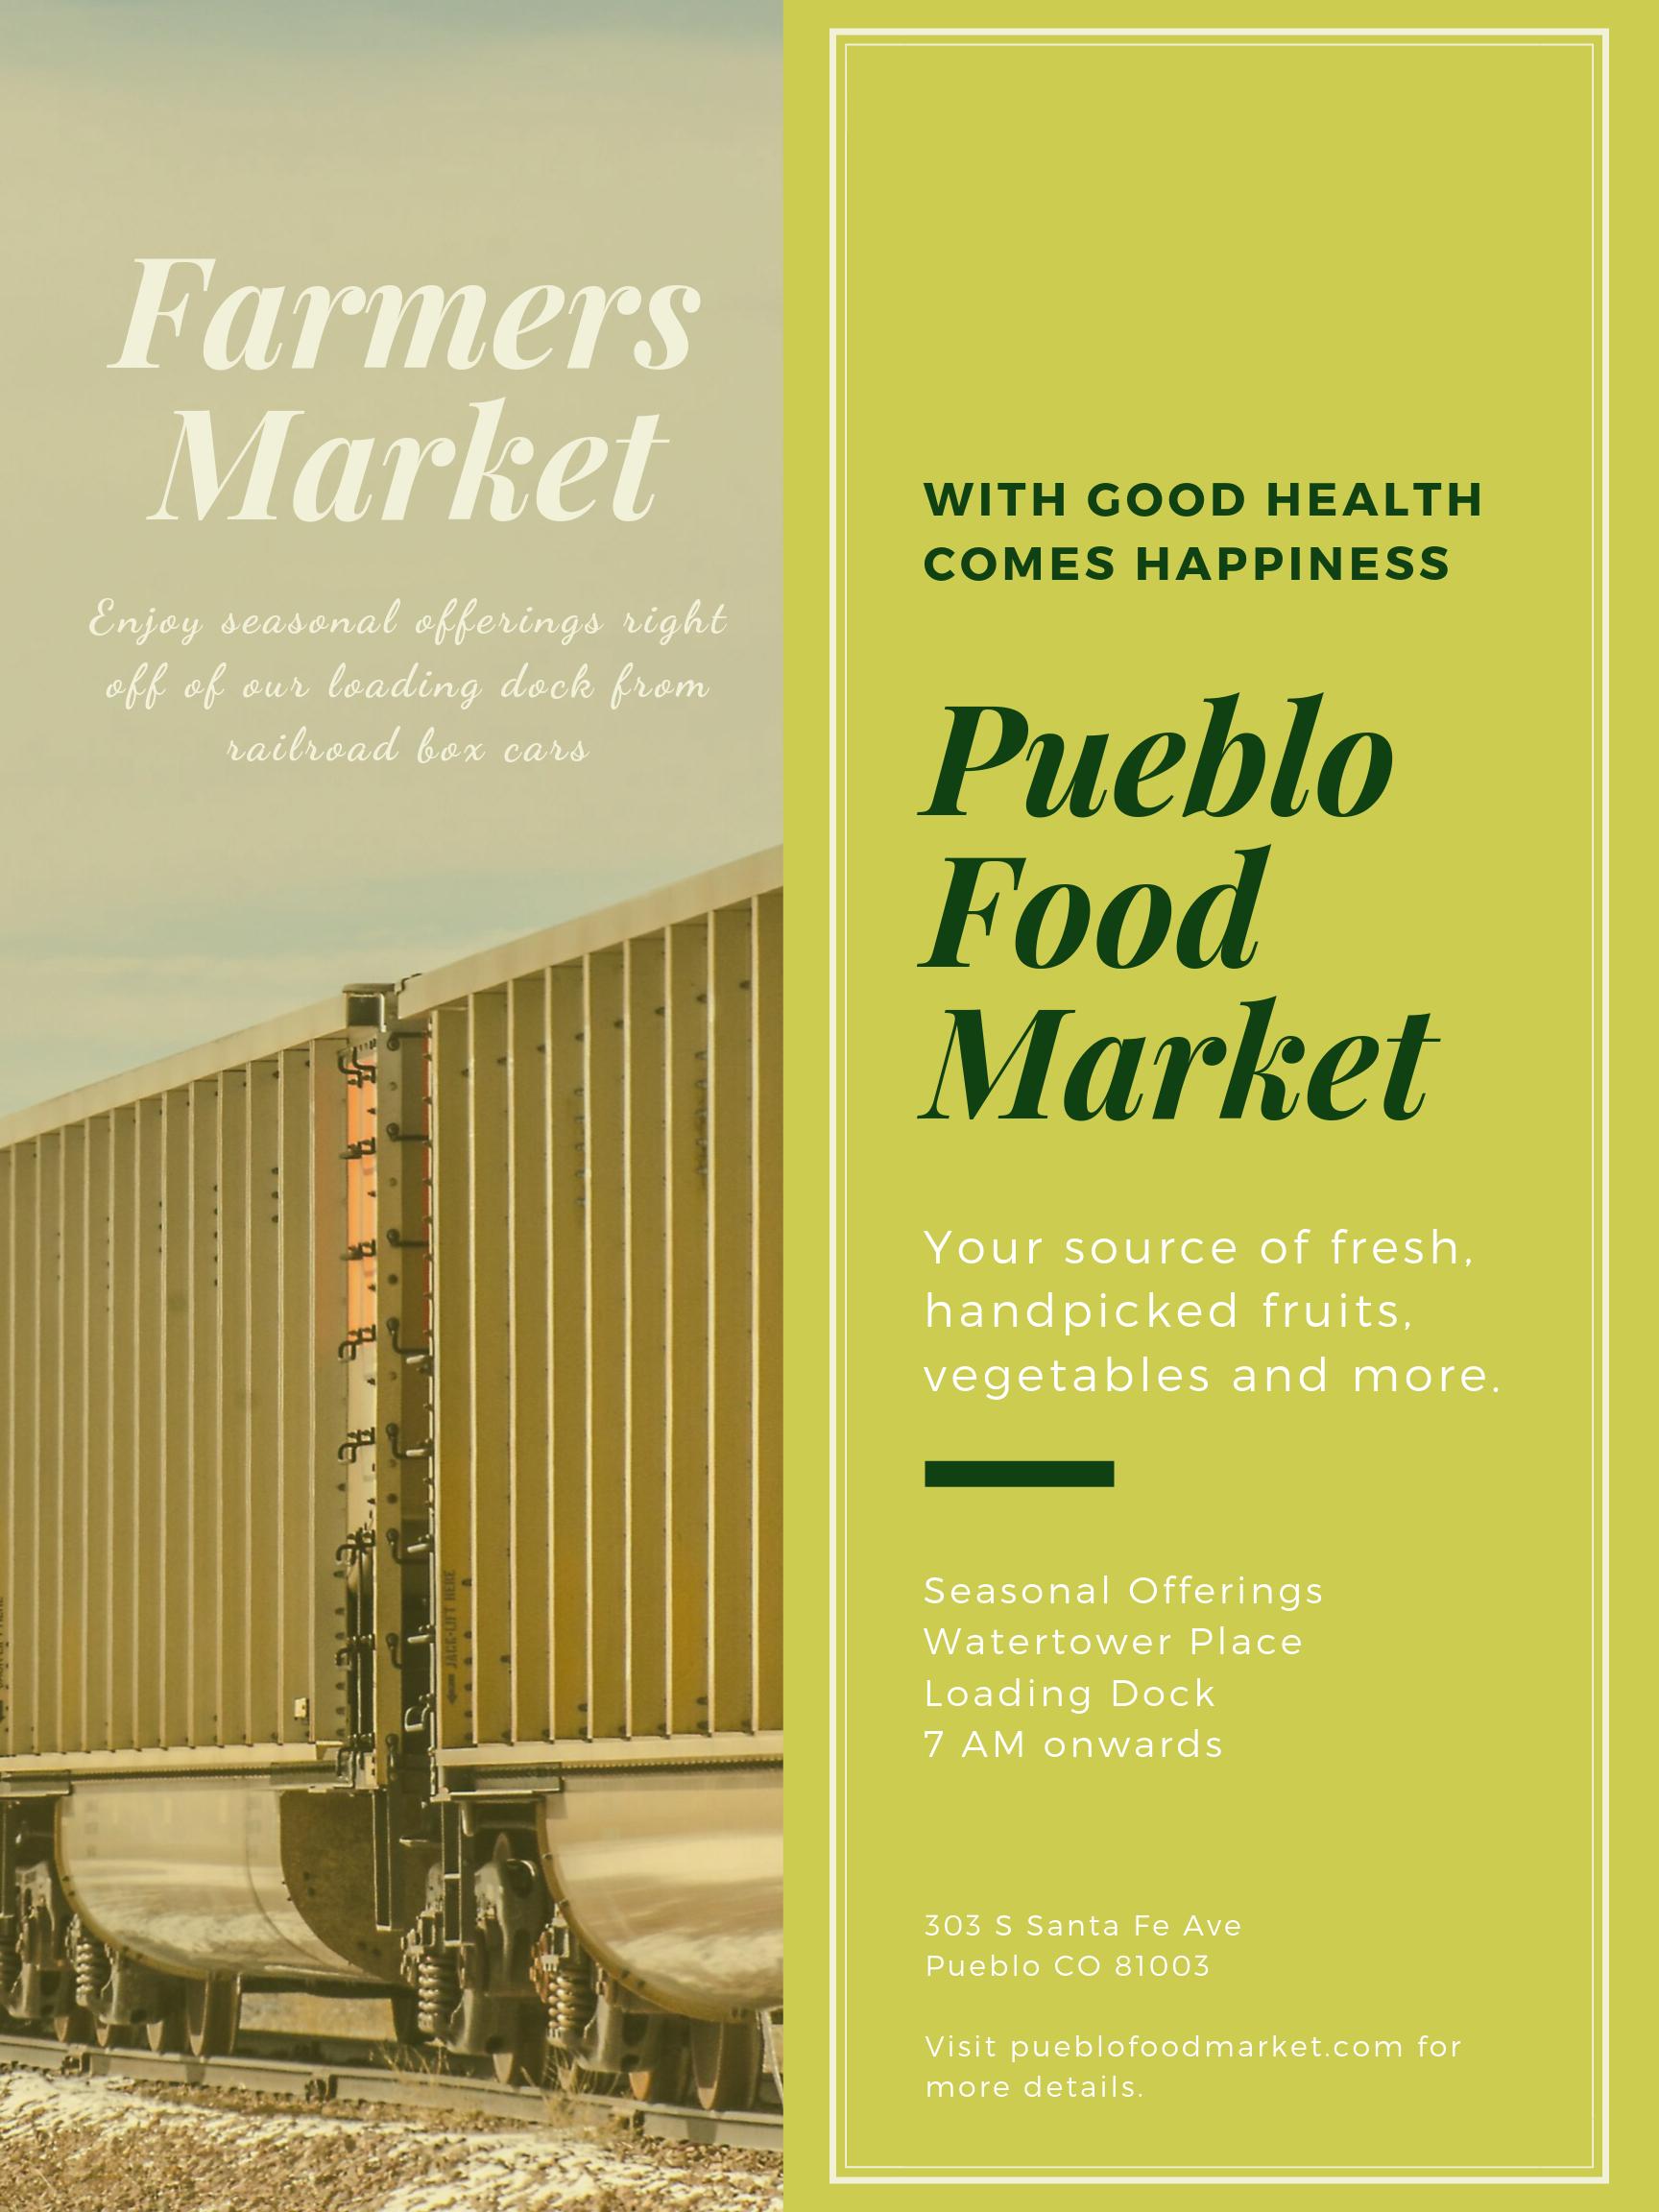 WP Farmers Market Pueblo Food Market.png